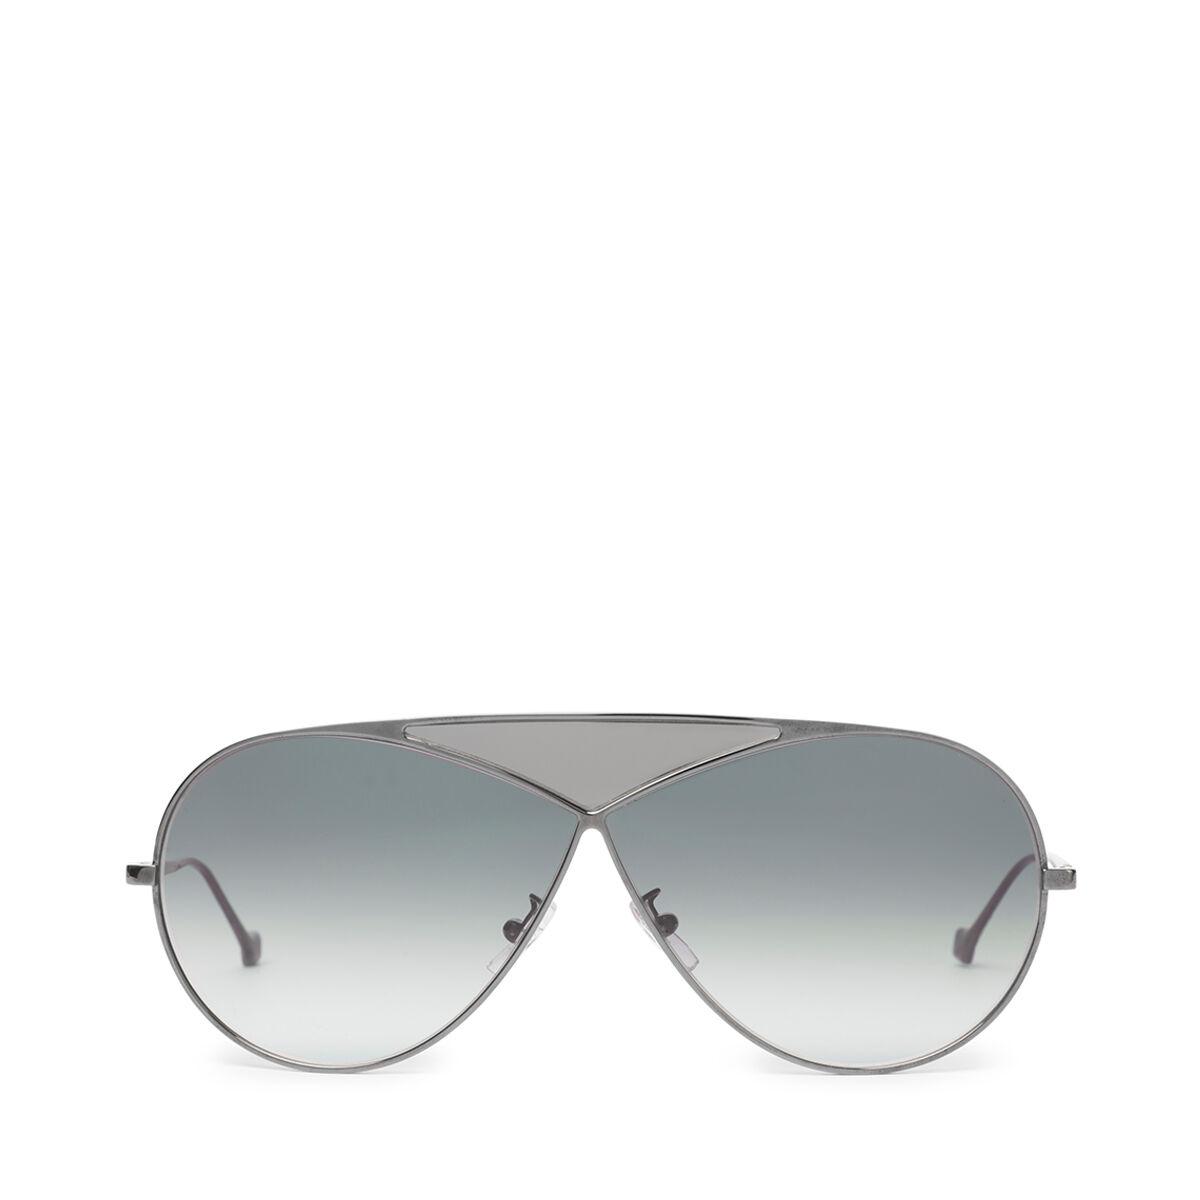 LOEWE Pilot Puzzle Sunglasses Shiny Rhodium/Gradient Smoke all